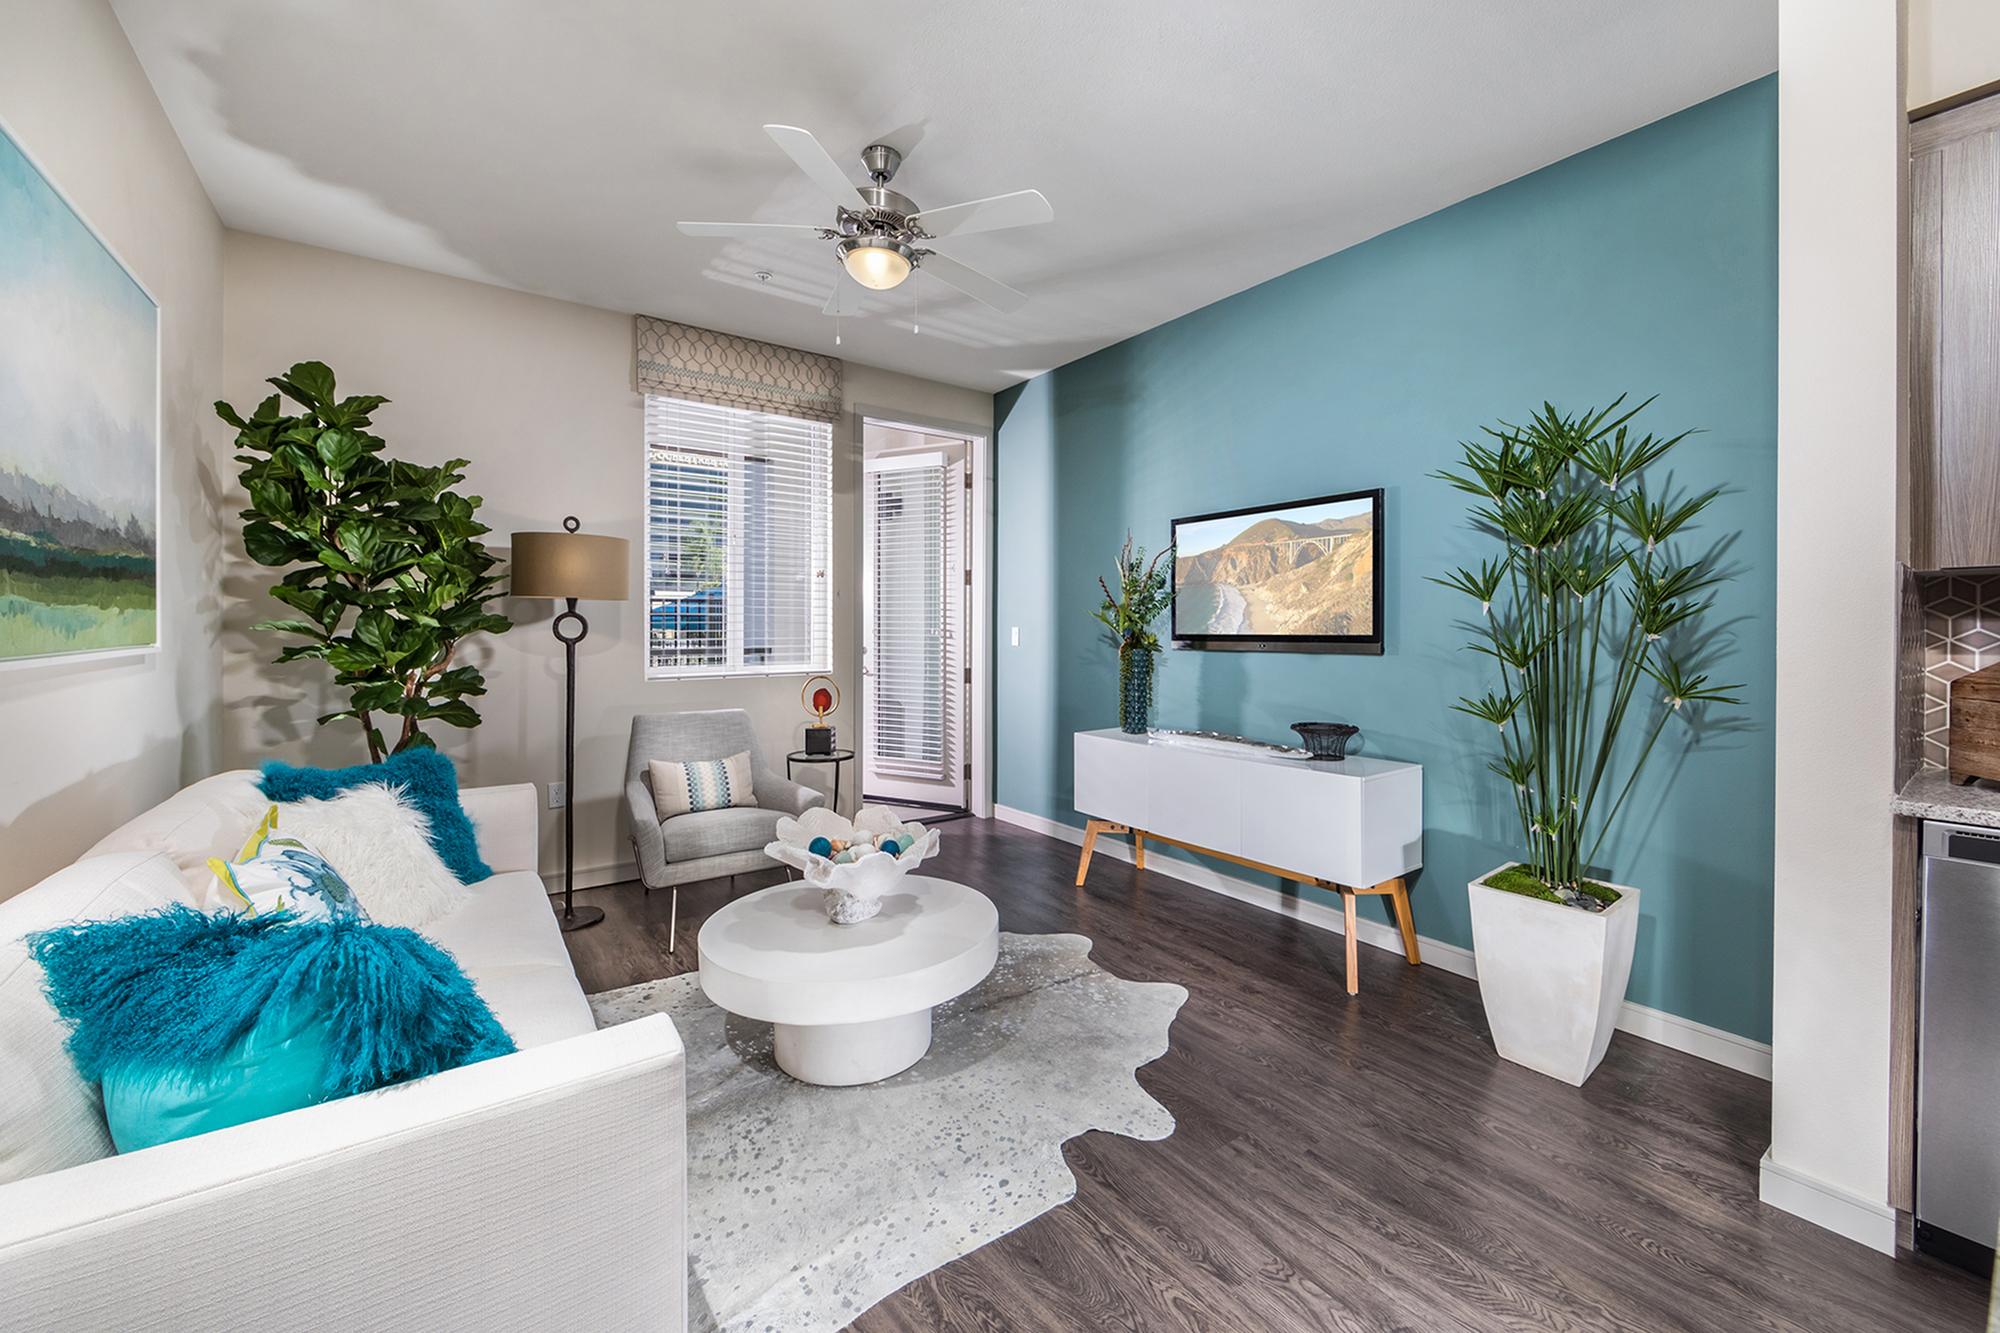 Living room at Areum Apartments in Monrovia CA